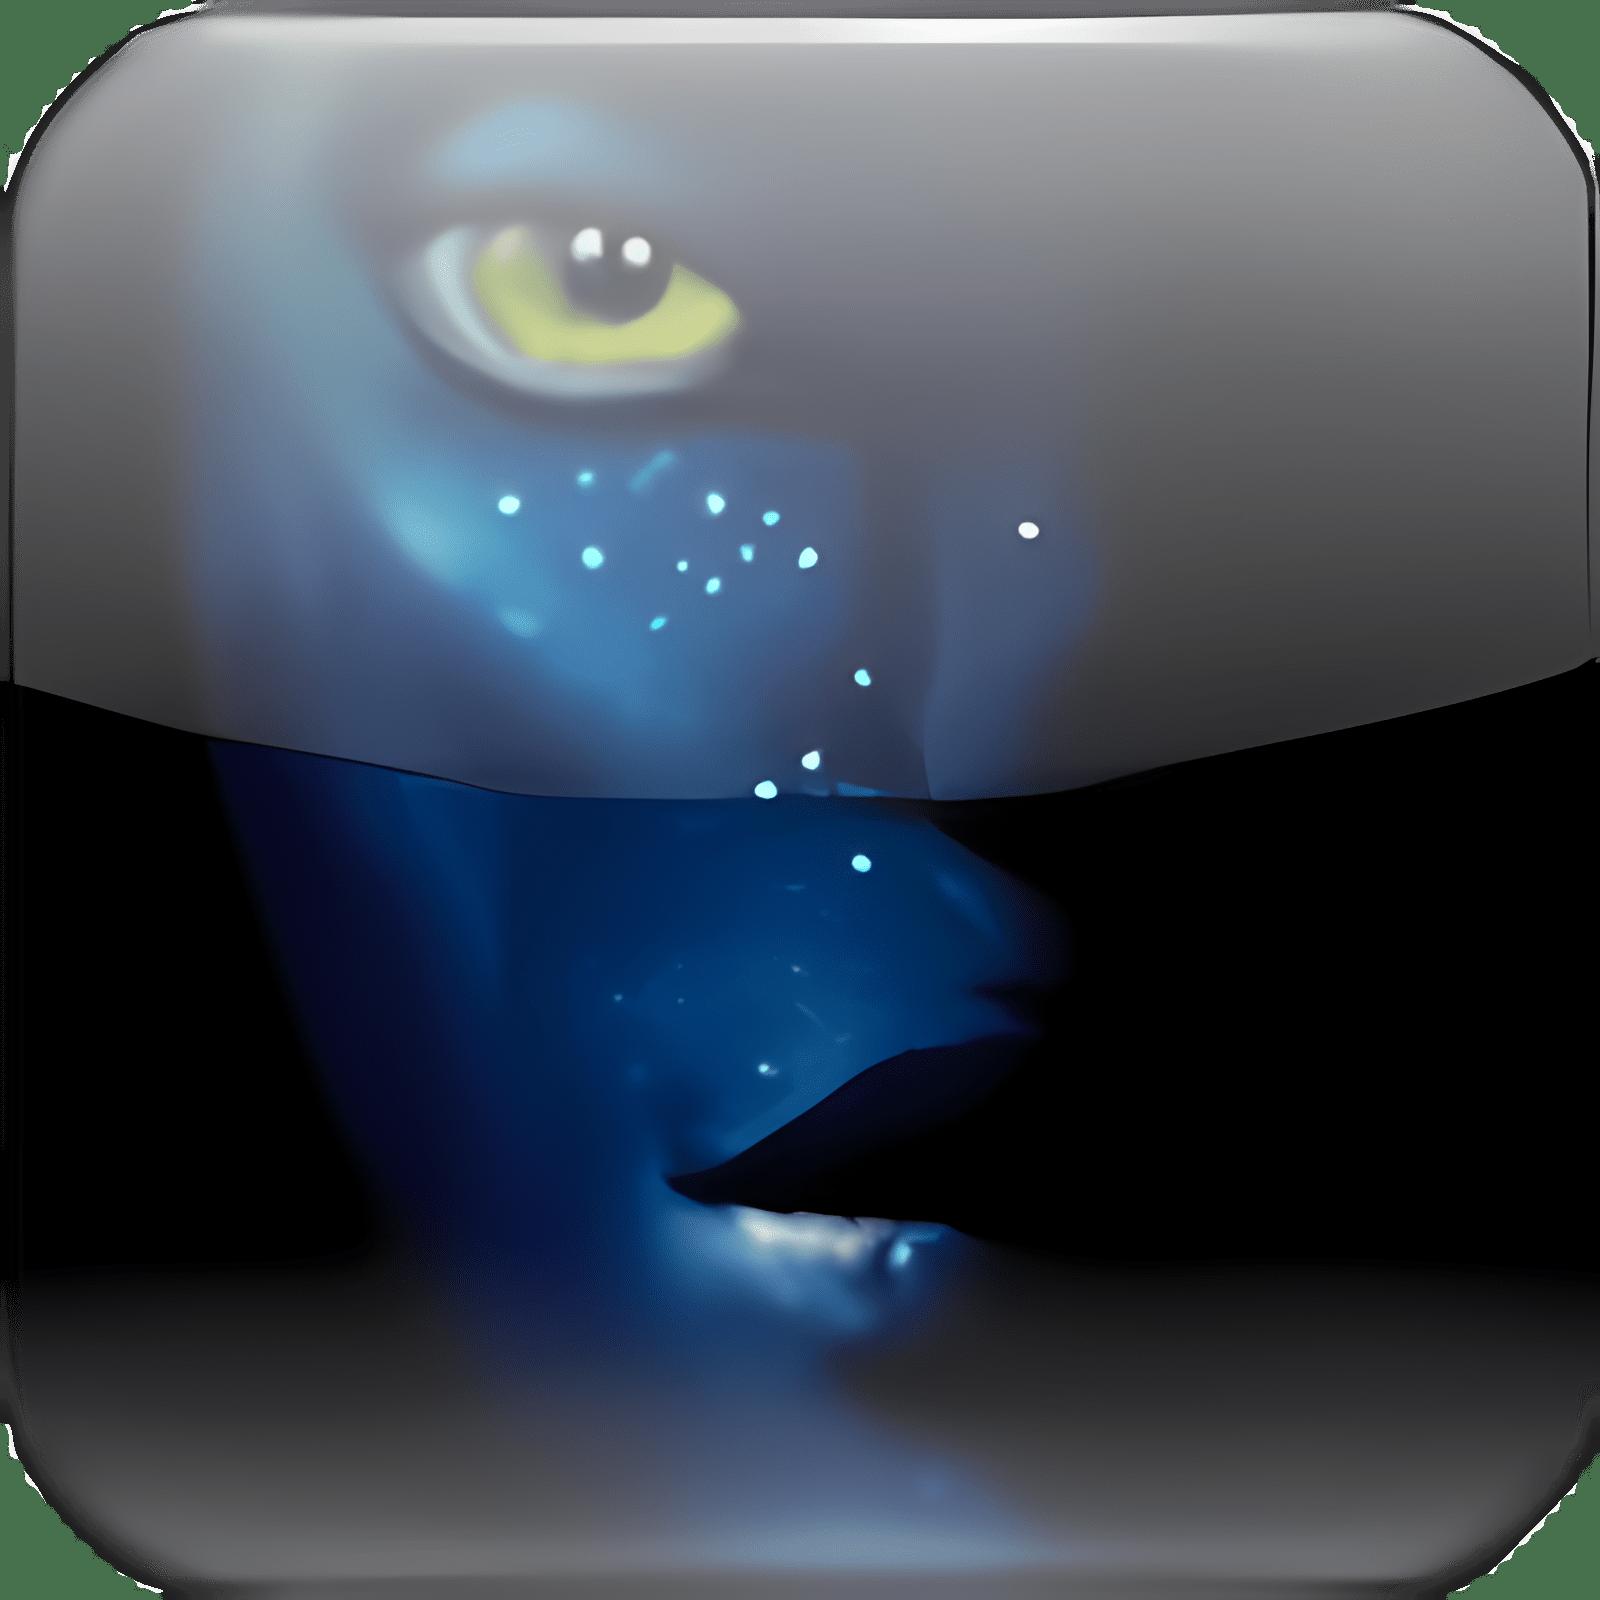 James Cameron's Avatar